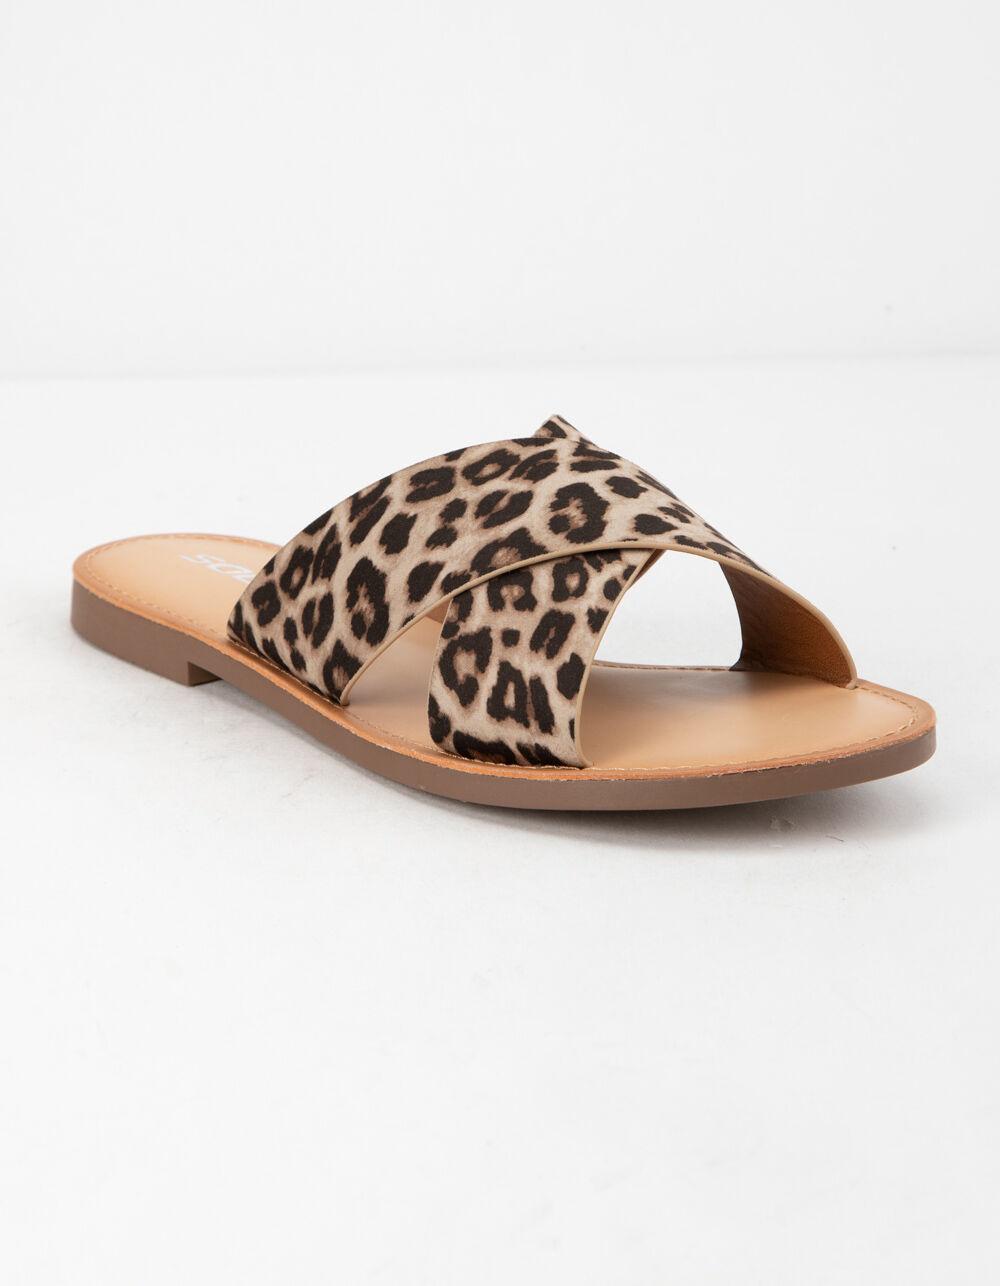 SODA Lunacy Leopard Sandals